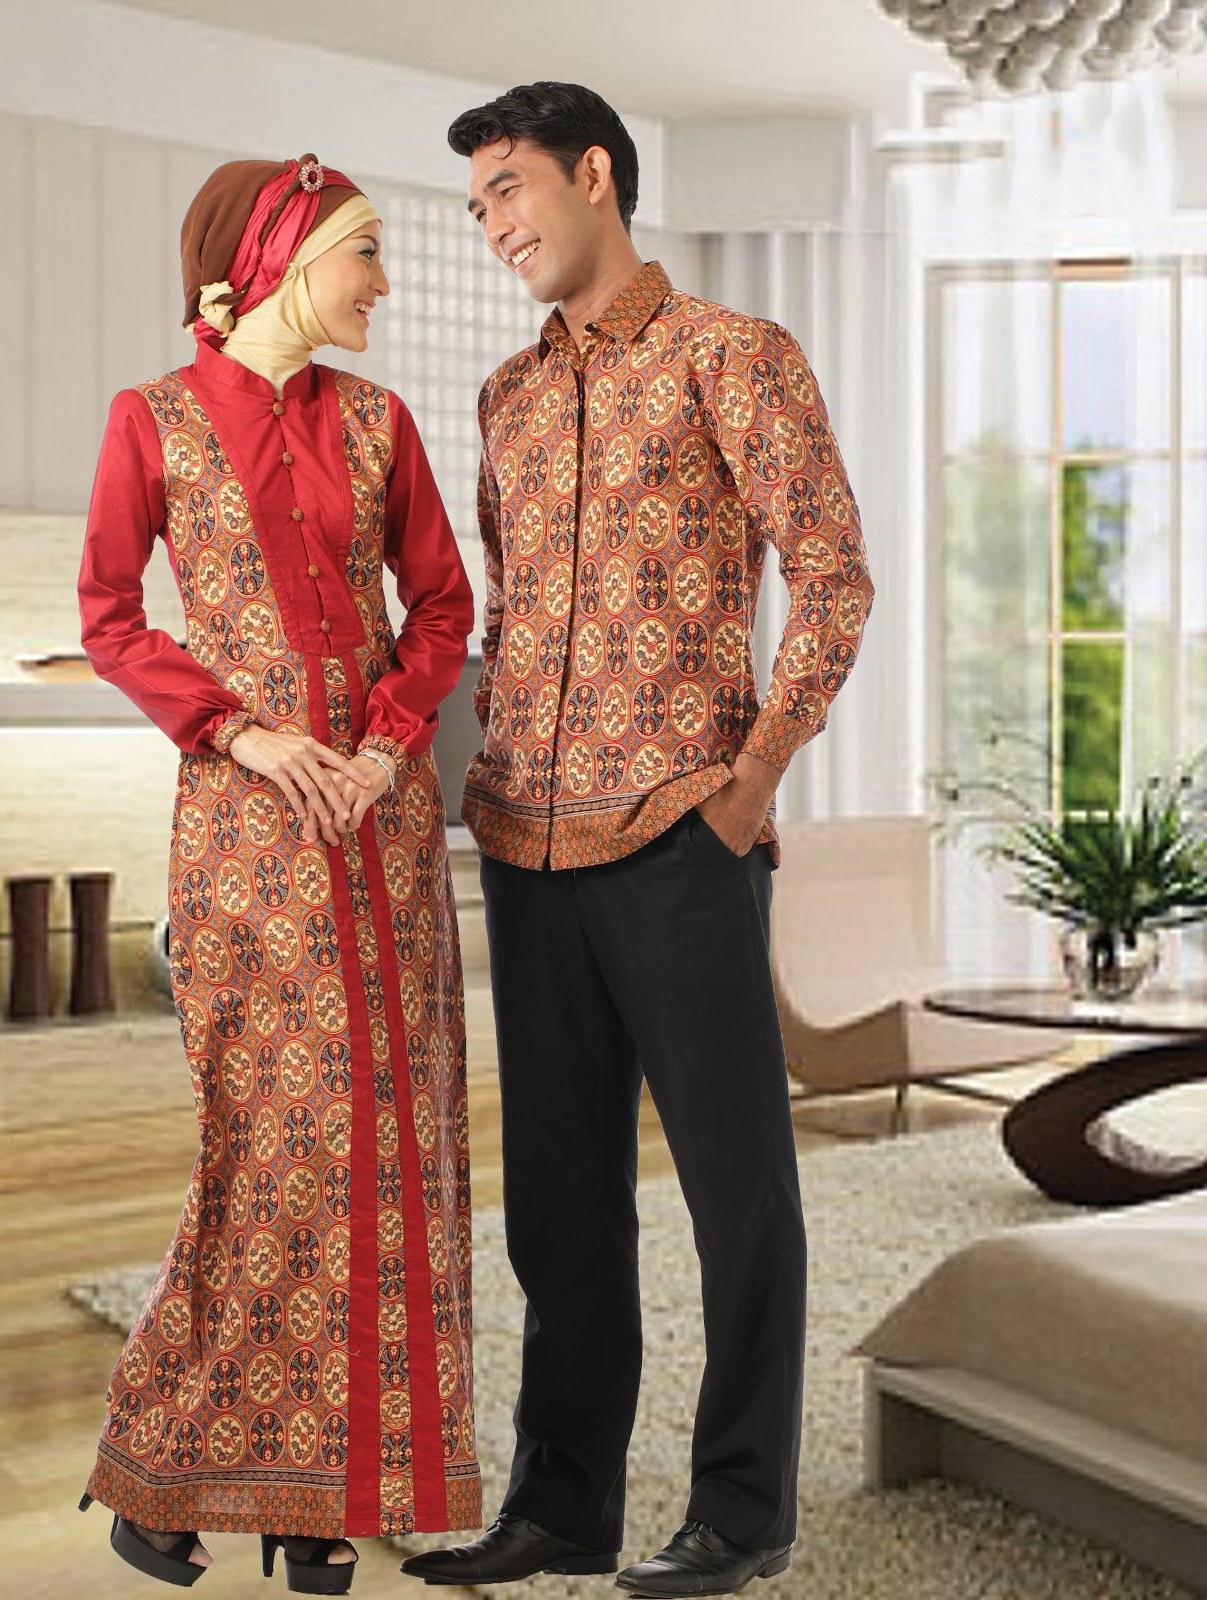 Bentuk Model Baju Lebaran Modern X8d1 Trend Model Baju Batik Lebaran Terbaru 2013